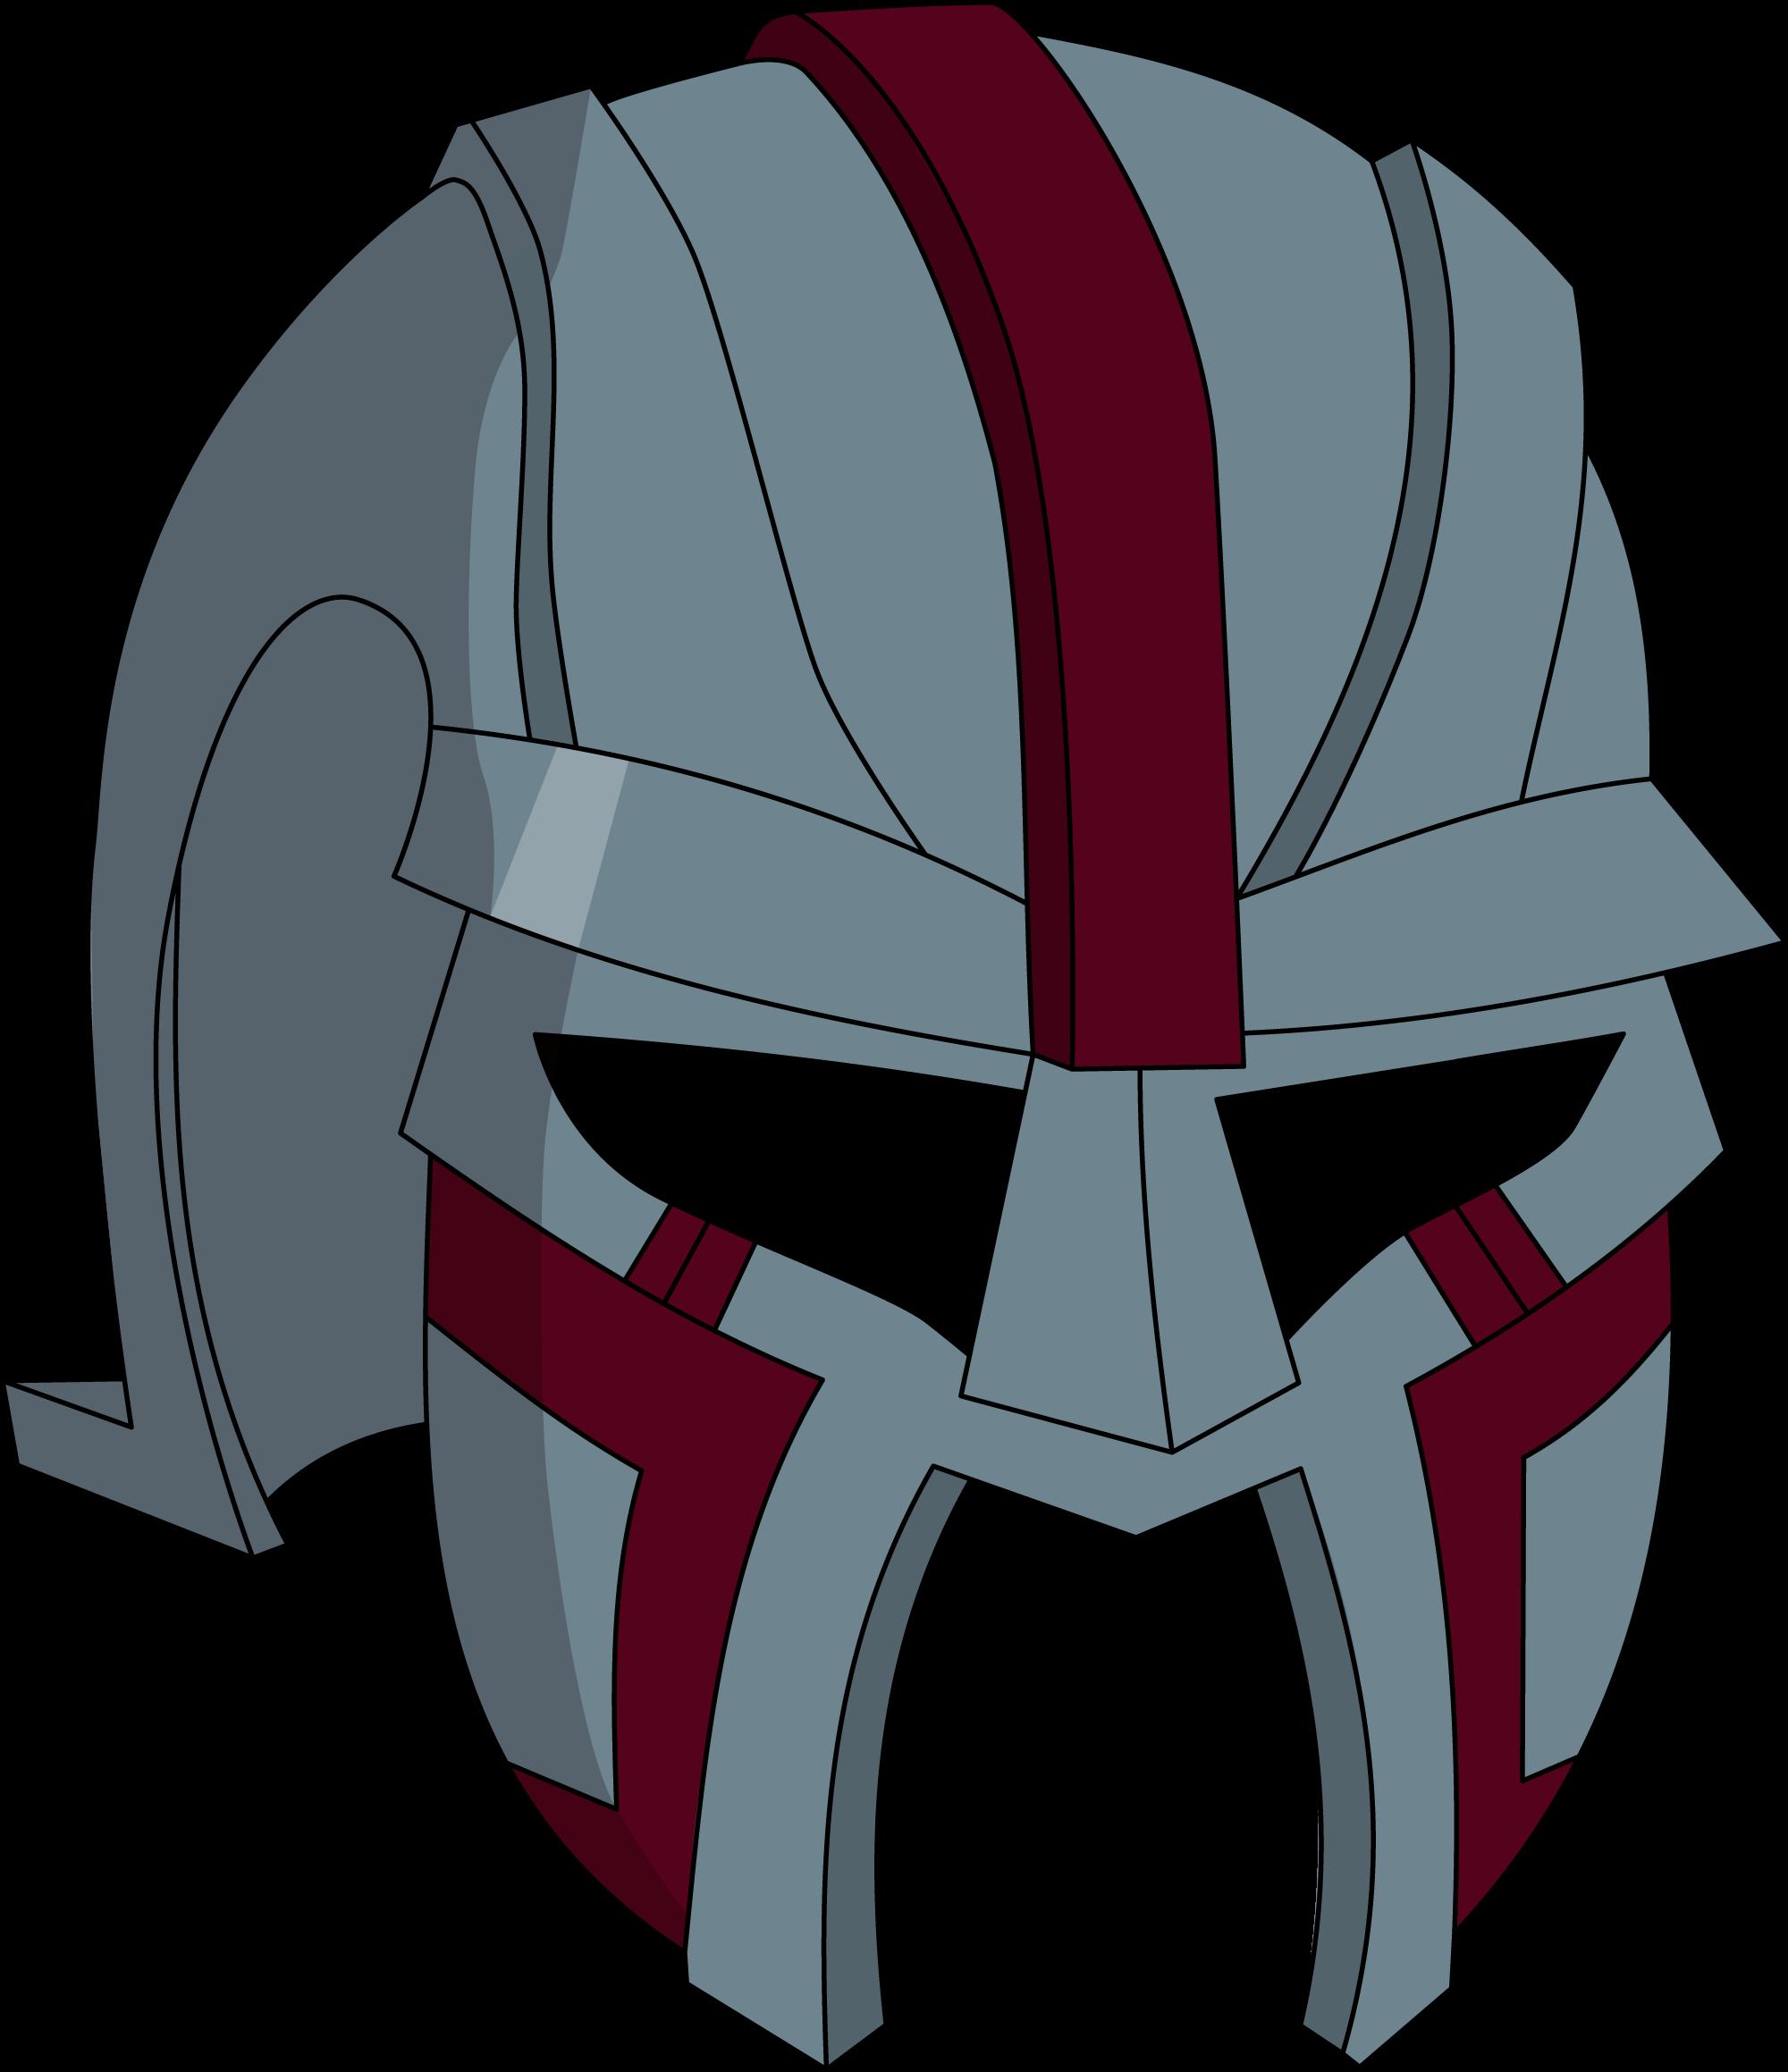 File:Wushu Helmet 1.png